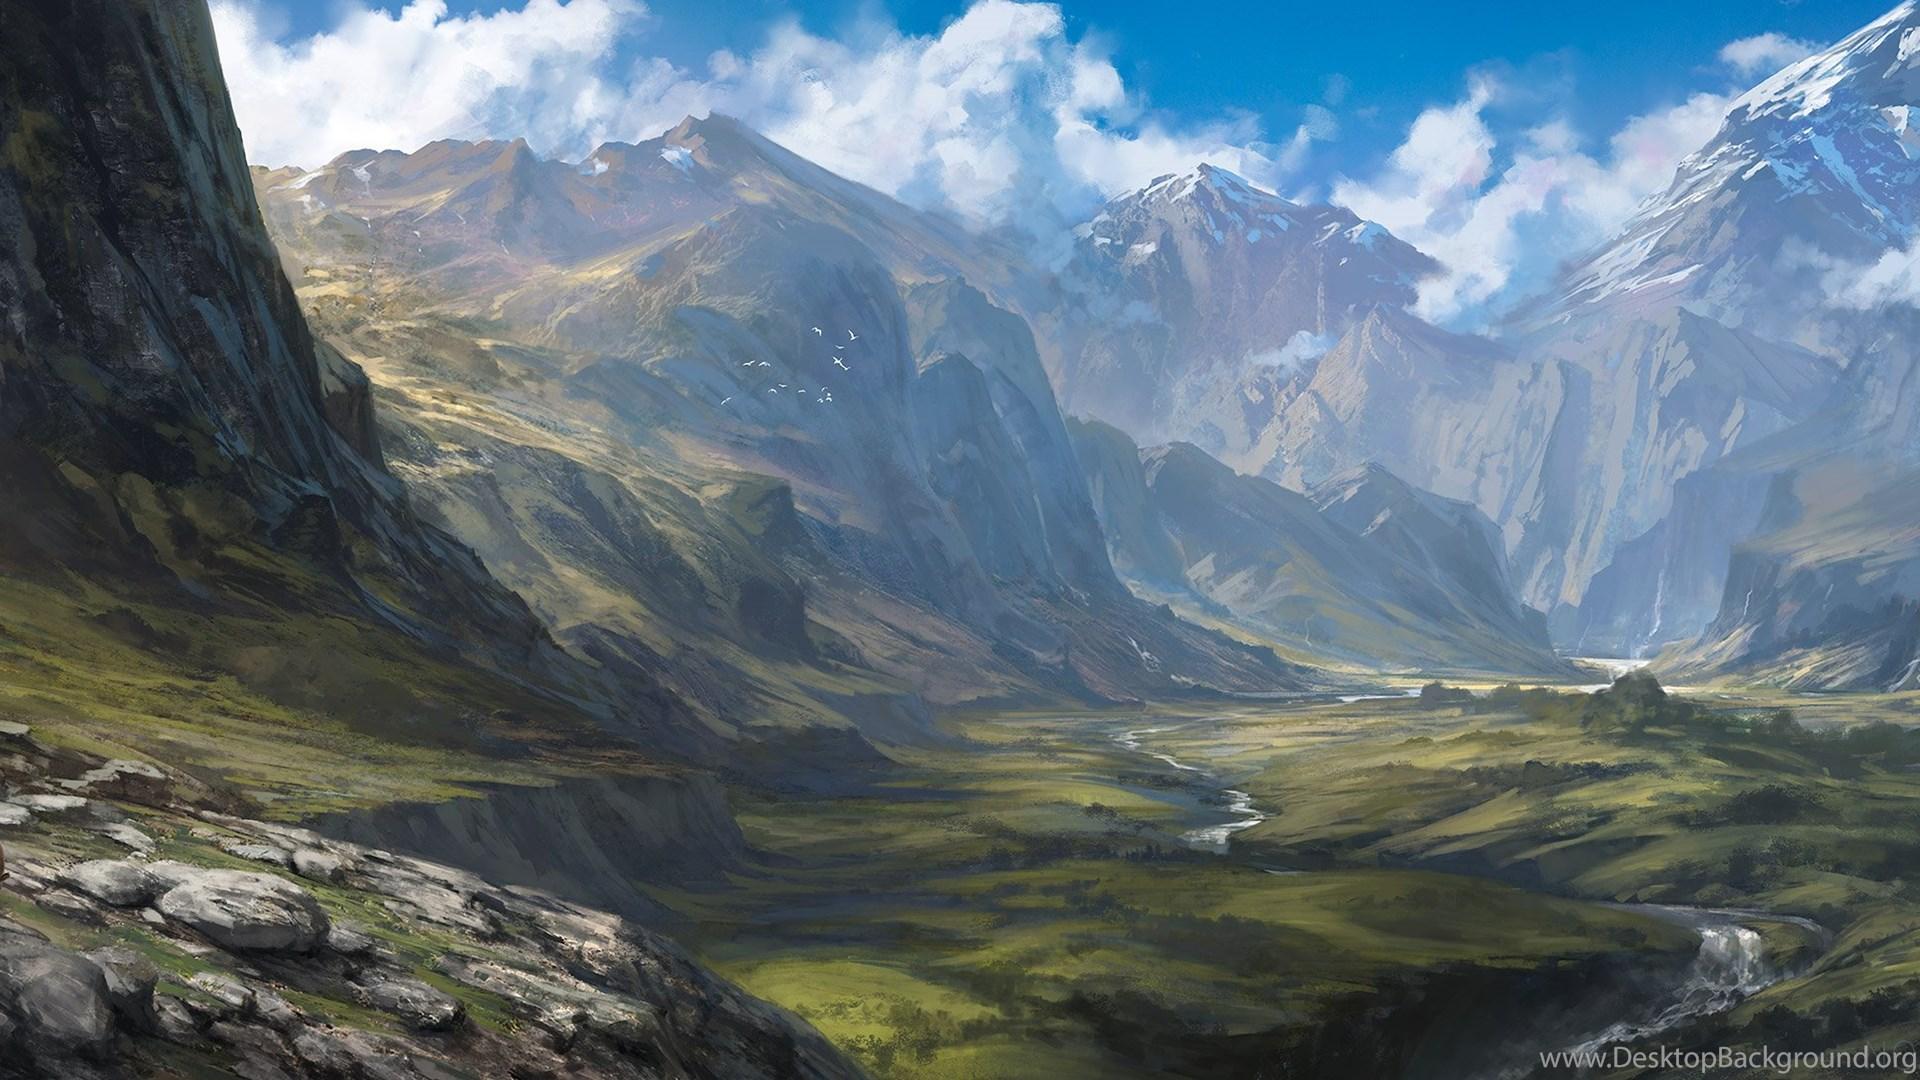 Fantasy scenery wallpapers desktop background - Fantasy scenery wallpaper ...